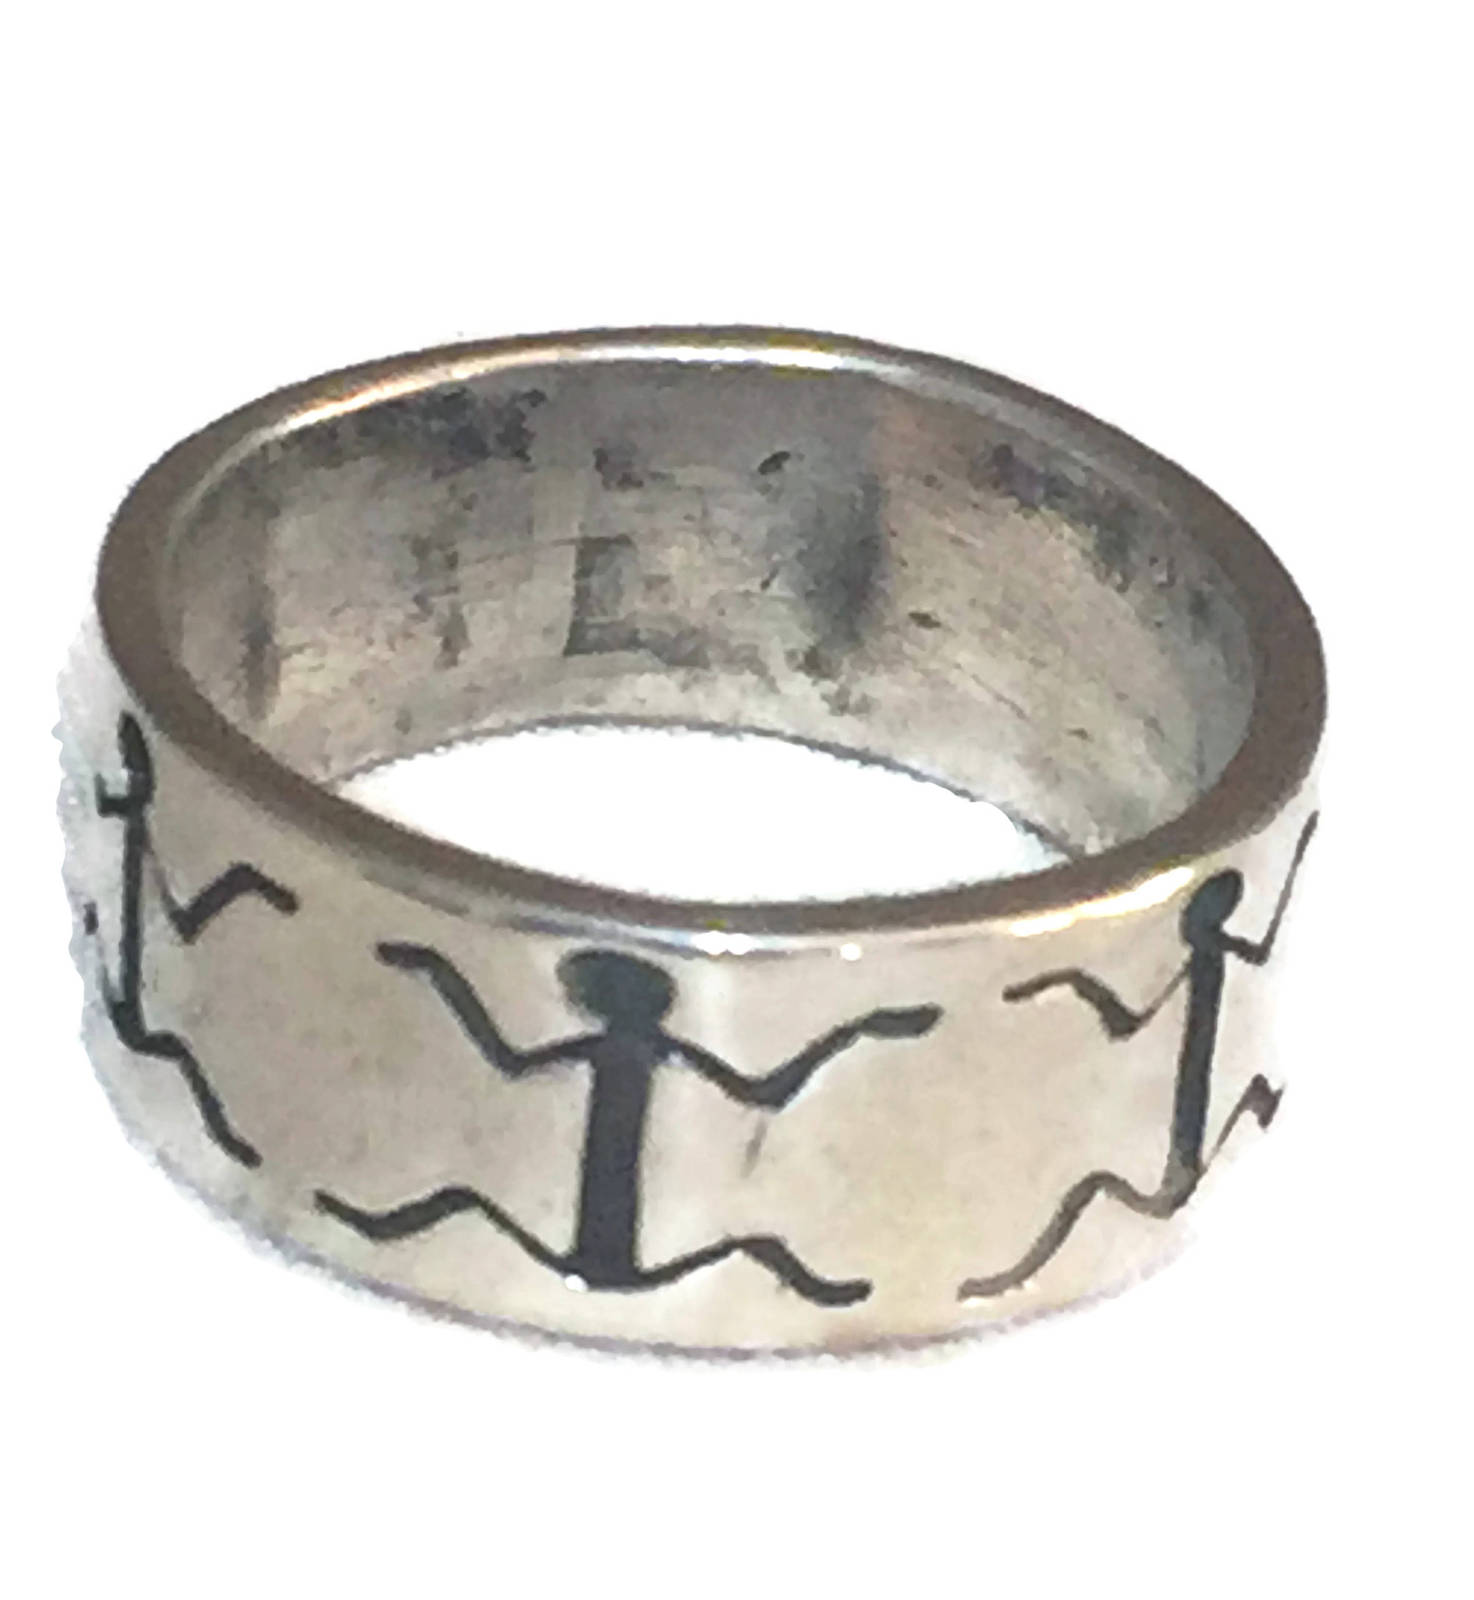 Stick Figure Sterling Silver Vintage Figurative Southwest Ring Band Size 8